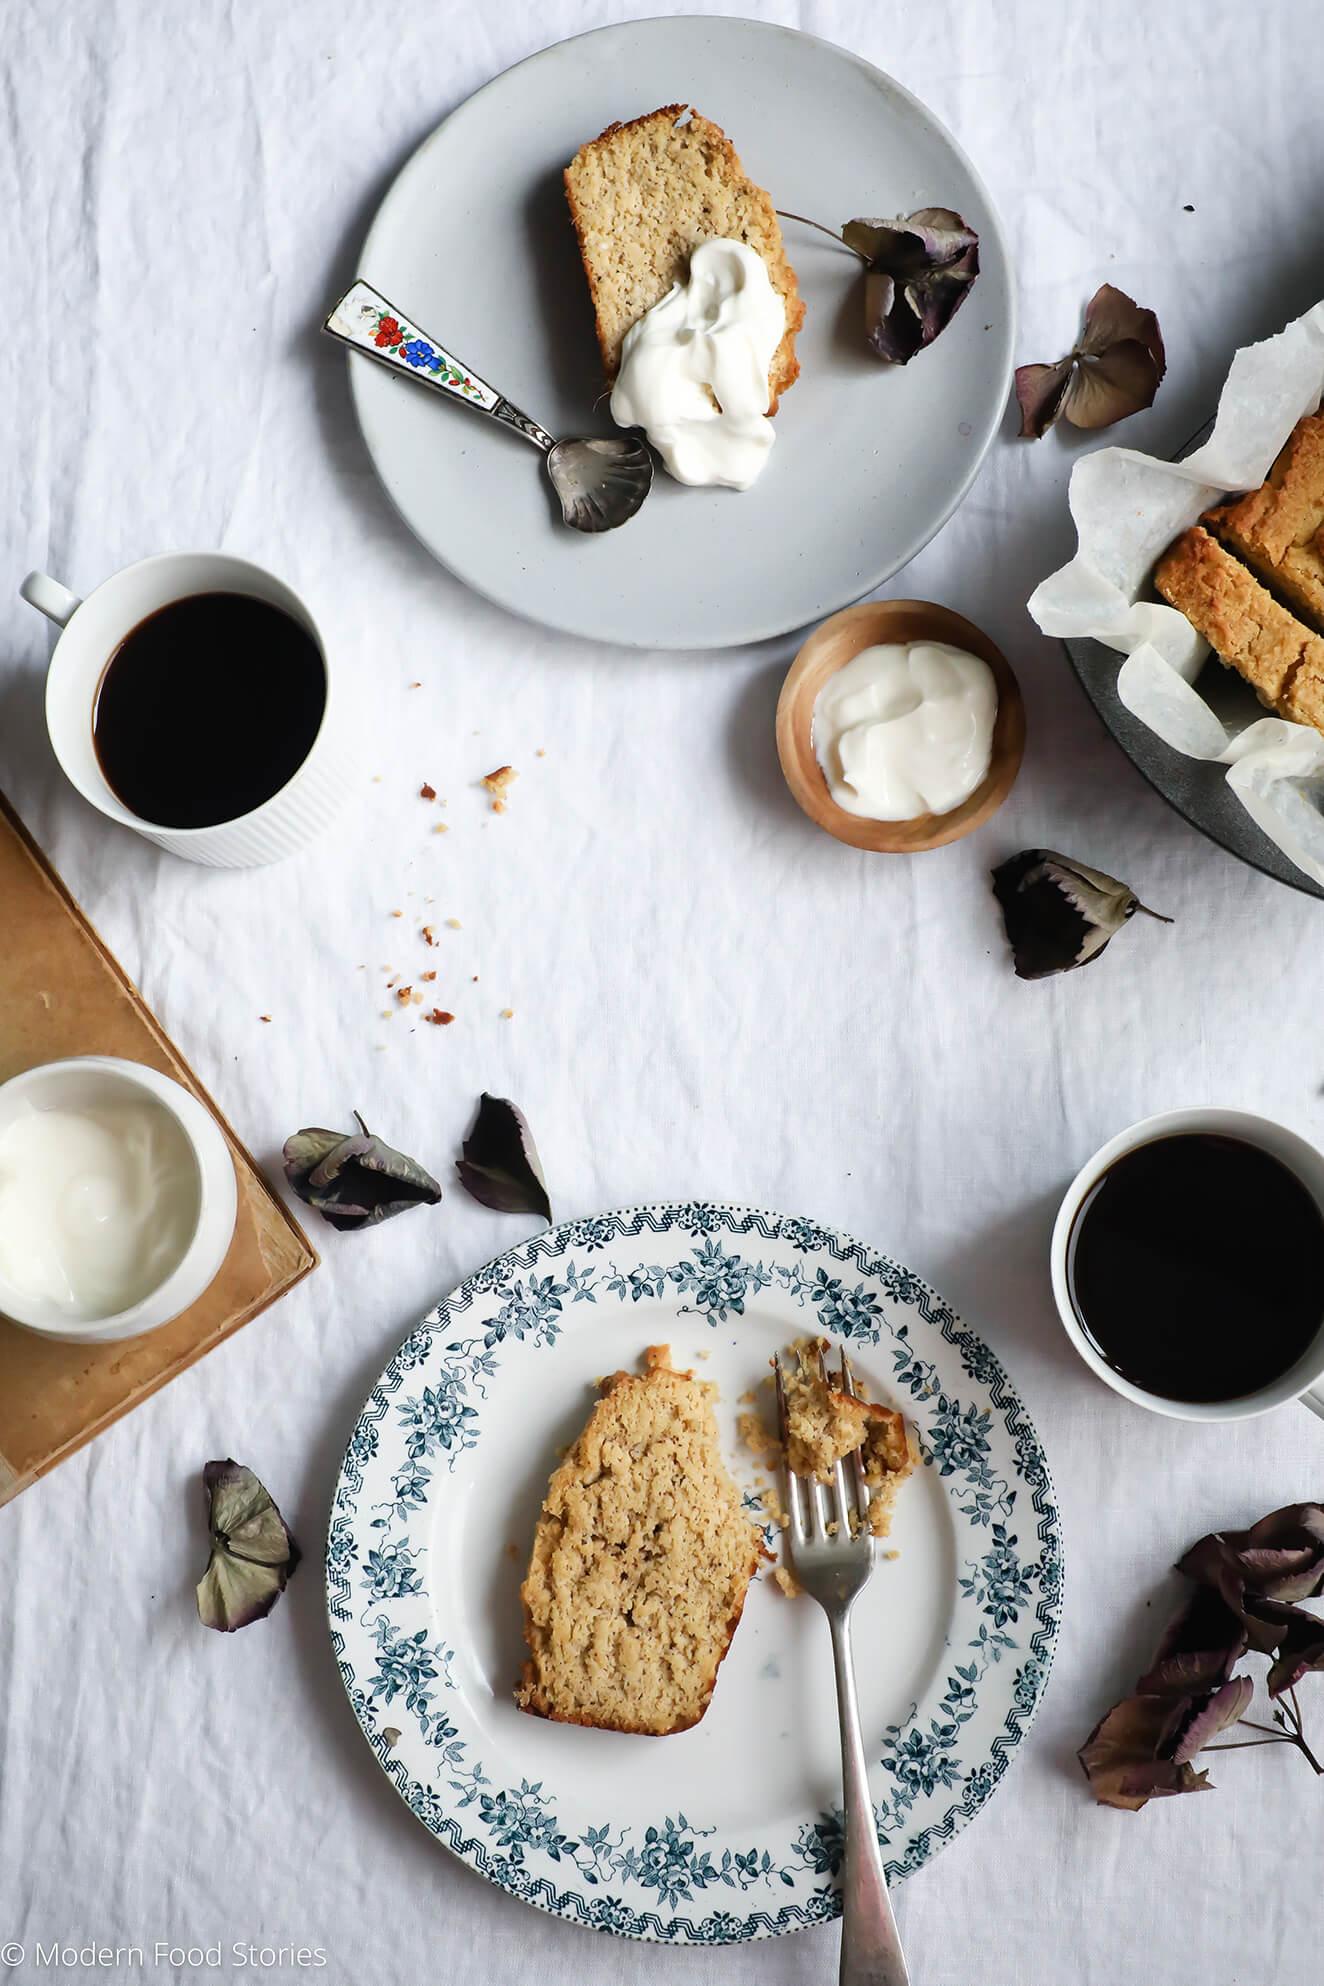 Paleo cake recipe, Paleo recipes, Modern Food Stories, Low carb ginger cake, low carb cake, food photography, cake food photography, food styling, Paleo Crust, Keto cake recipes, Keto recipes, Whole30 cakes, healthy treat recipes, sugar free cake, gluten free cake, grain free cake